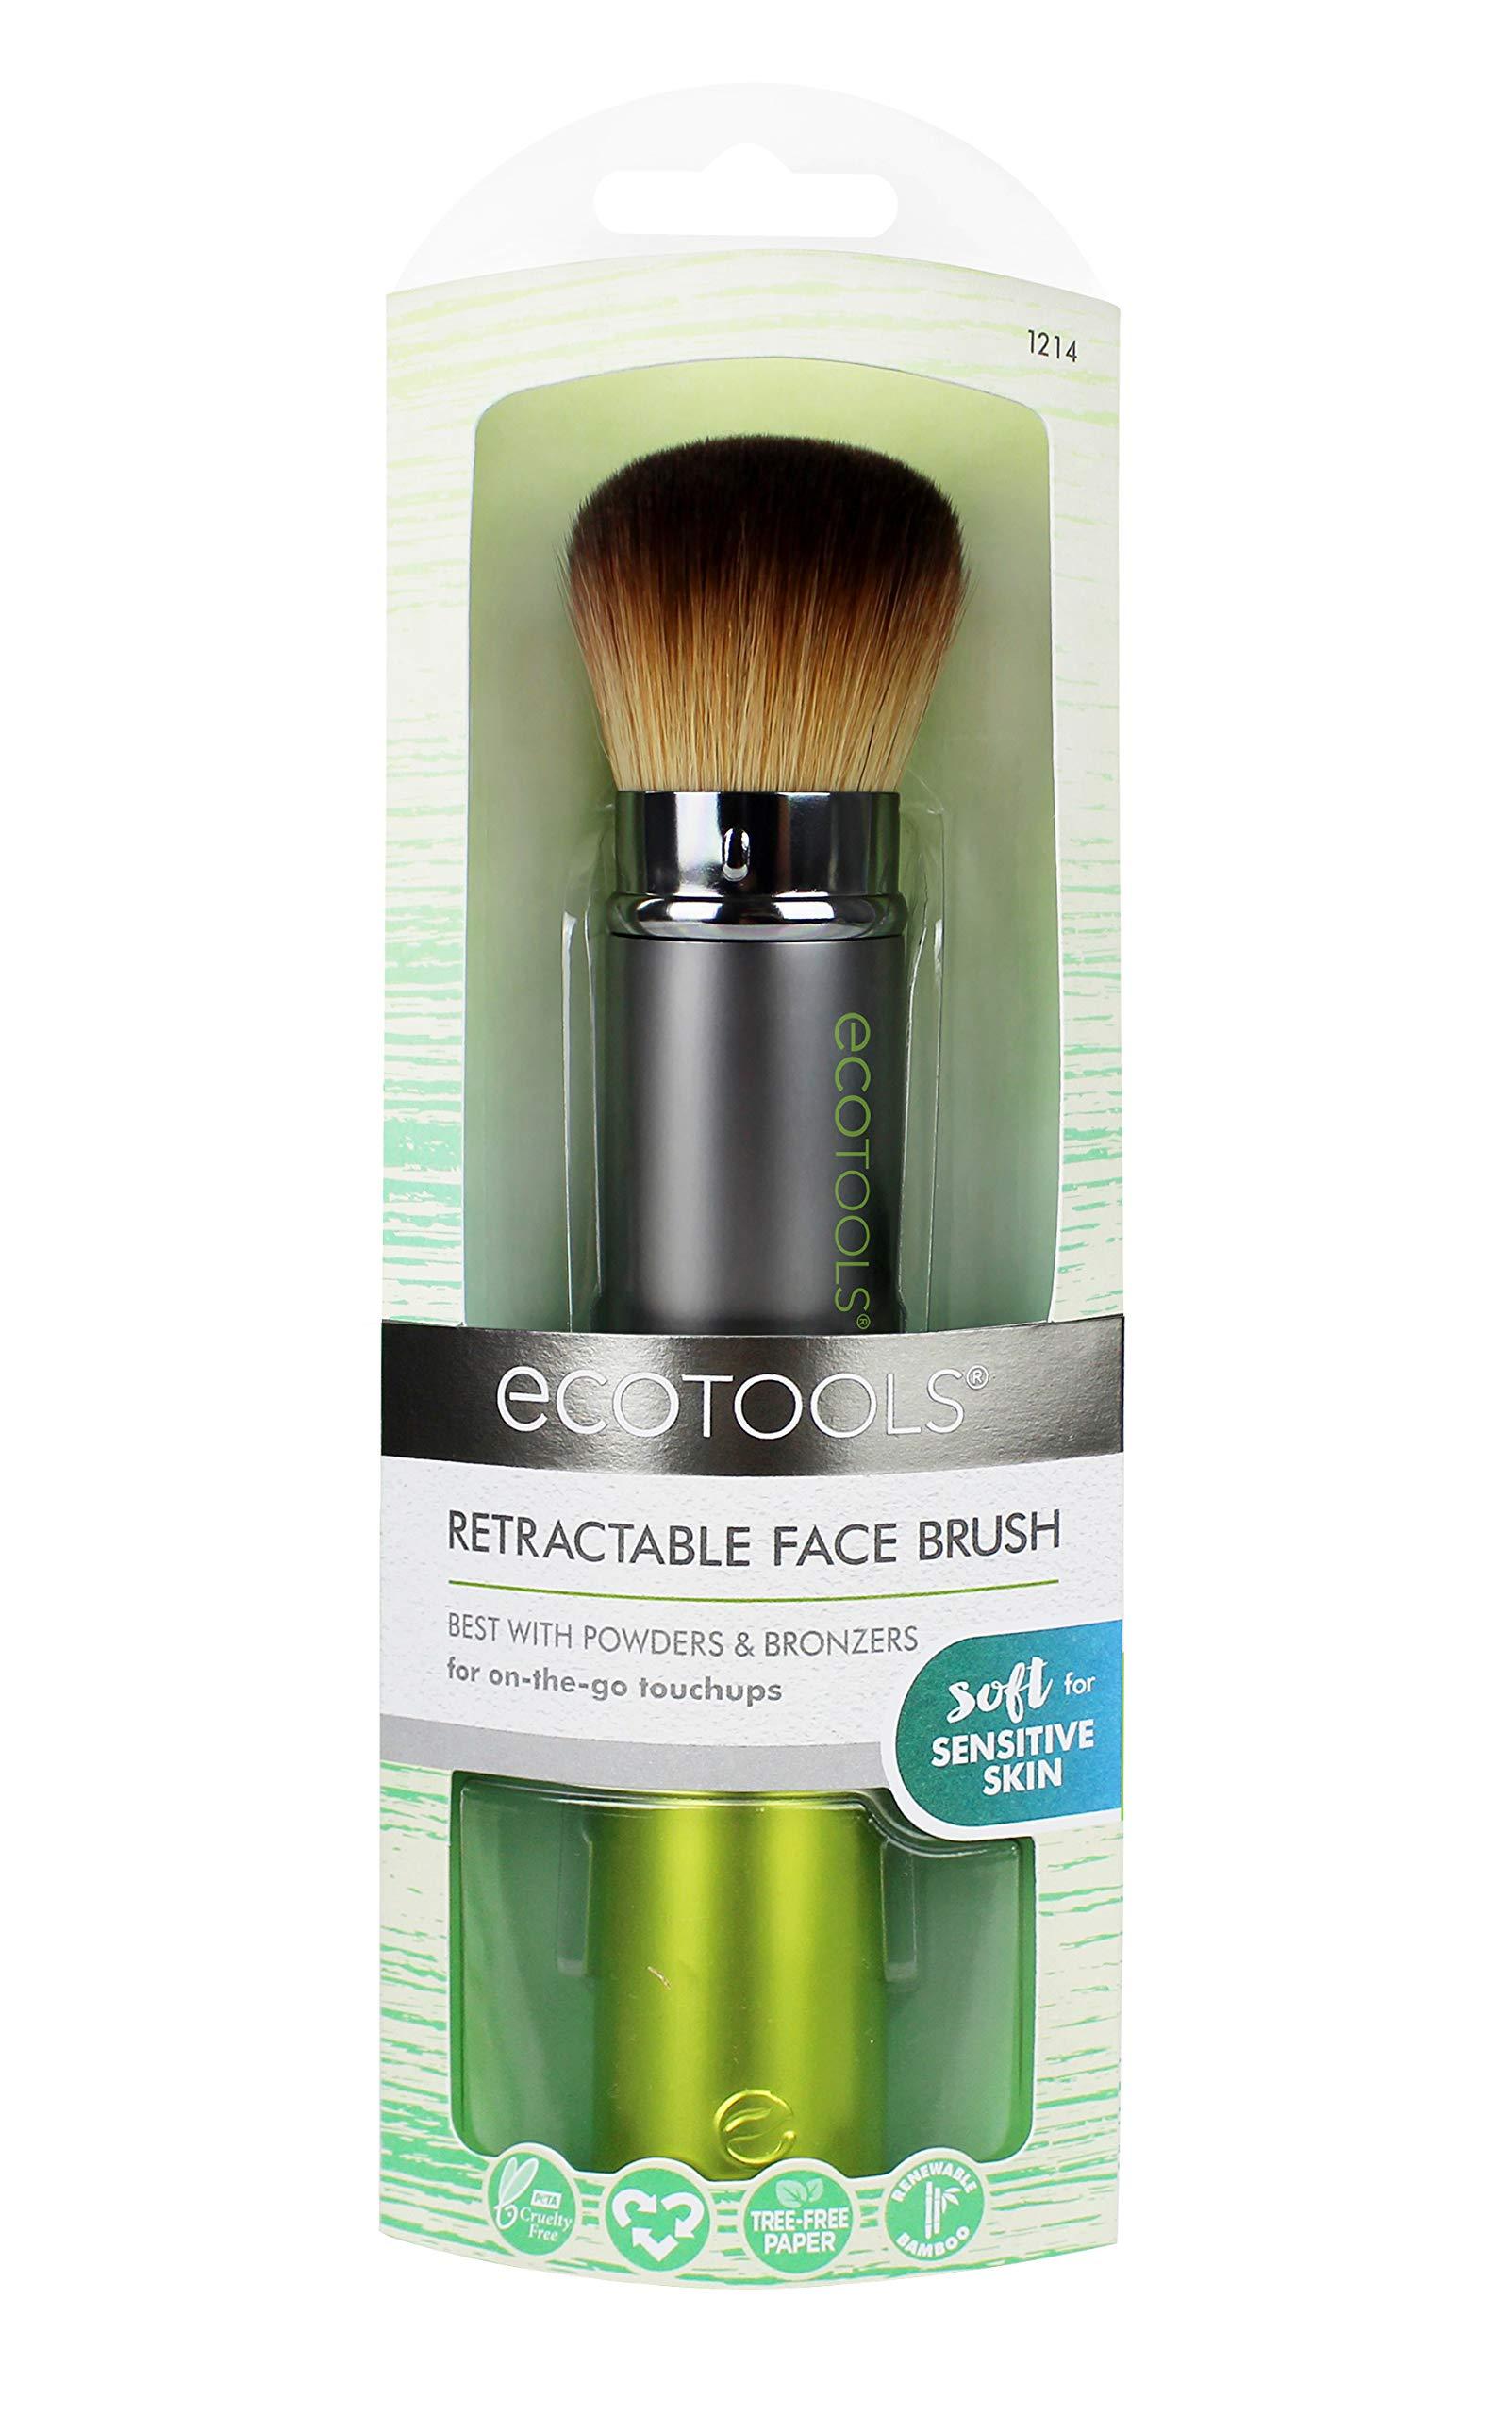 EcoTools Travel Kabuki Makeup Brush for Foundation, Blush, Bronzer, and Powder, Retractable